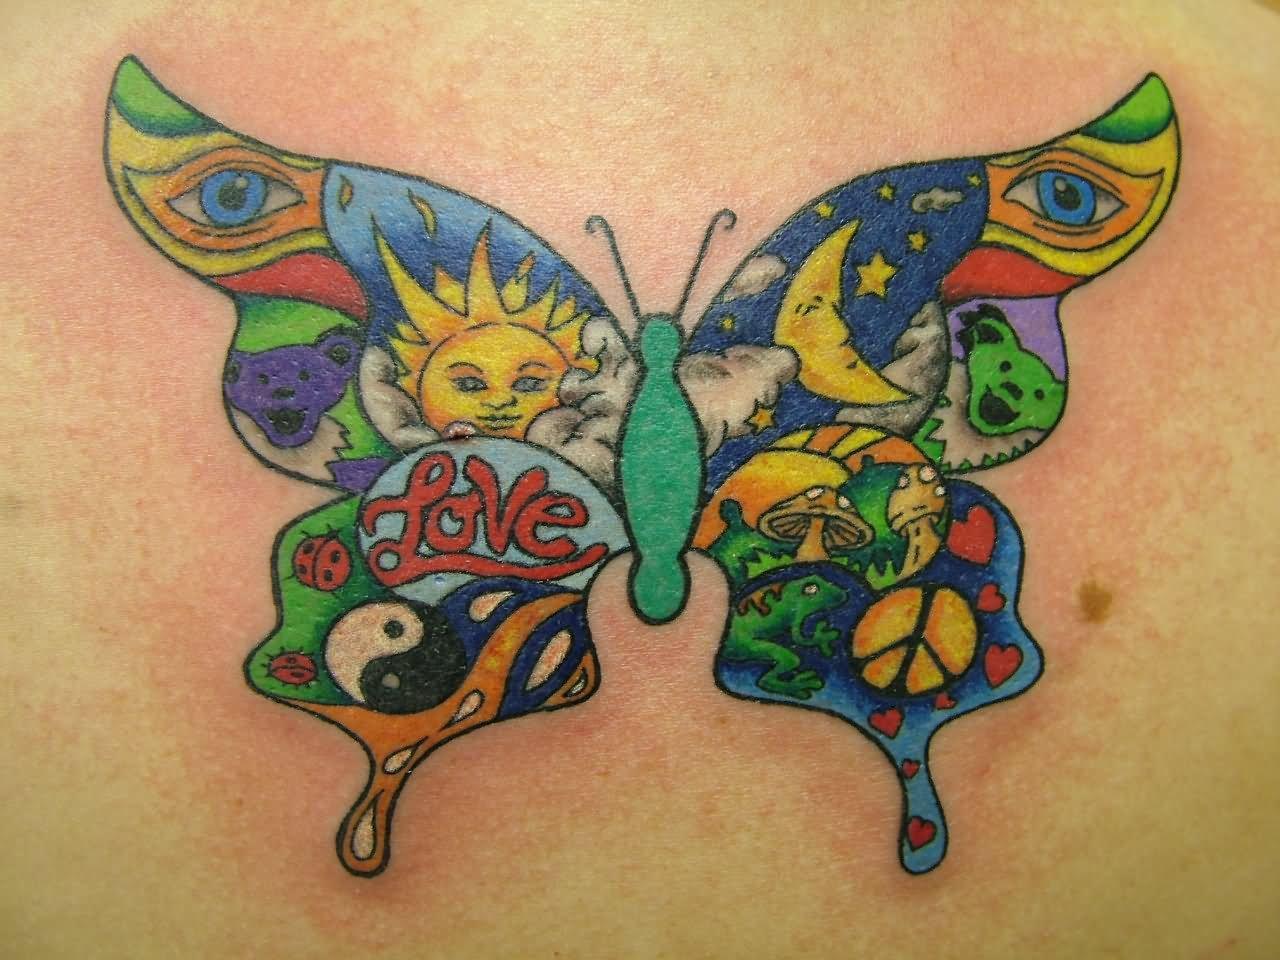 20 hippie tattoos designs. Black Bedroom Furniture Sets. Home Design Ideas